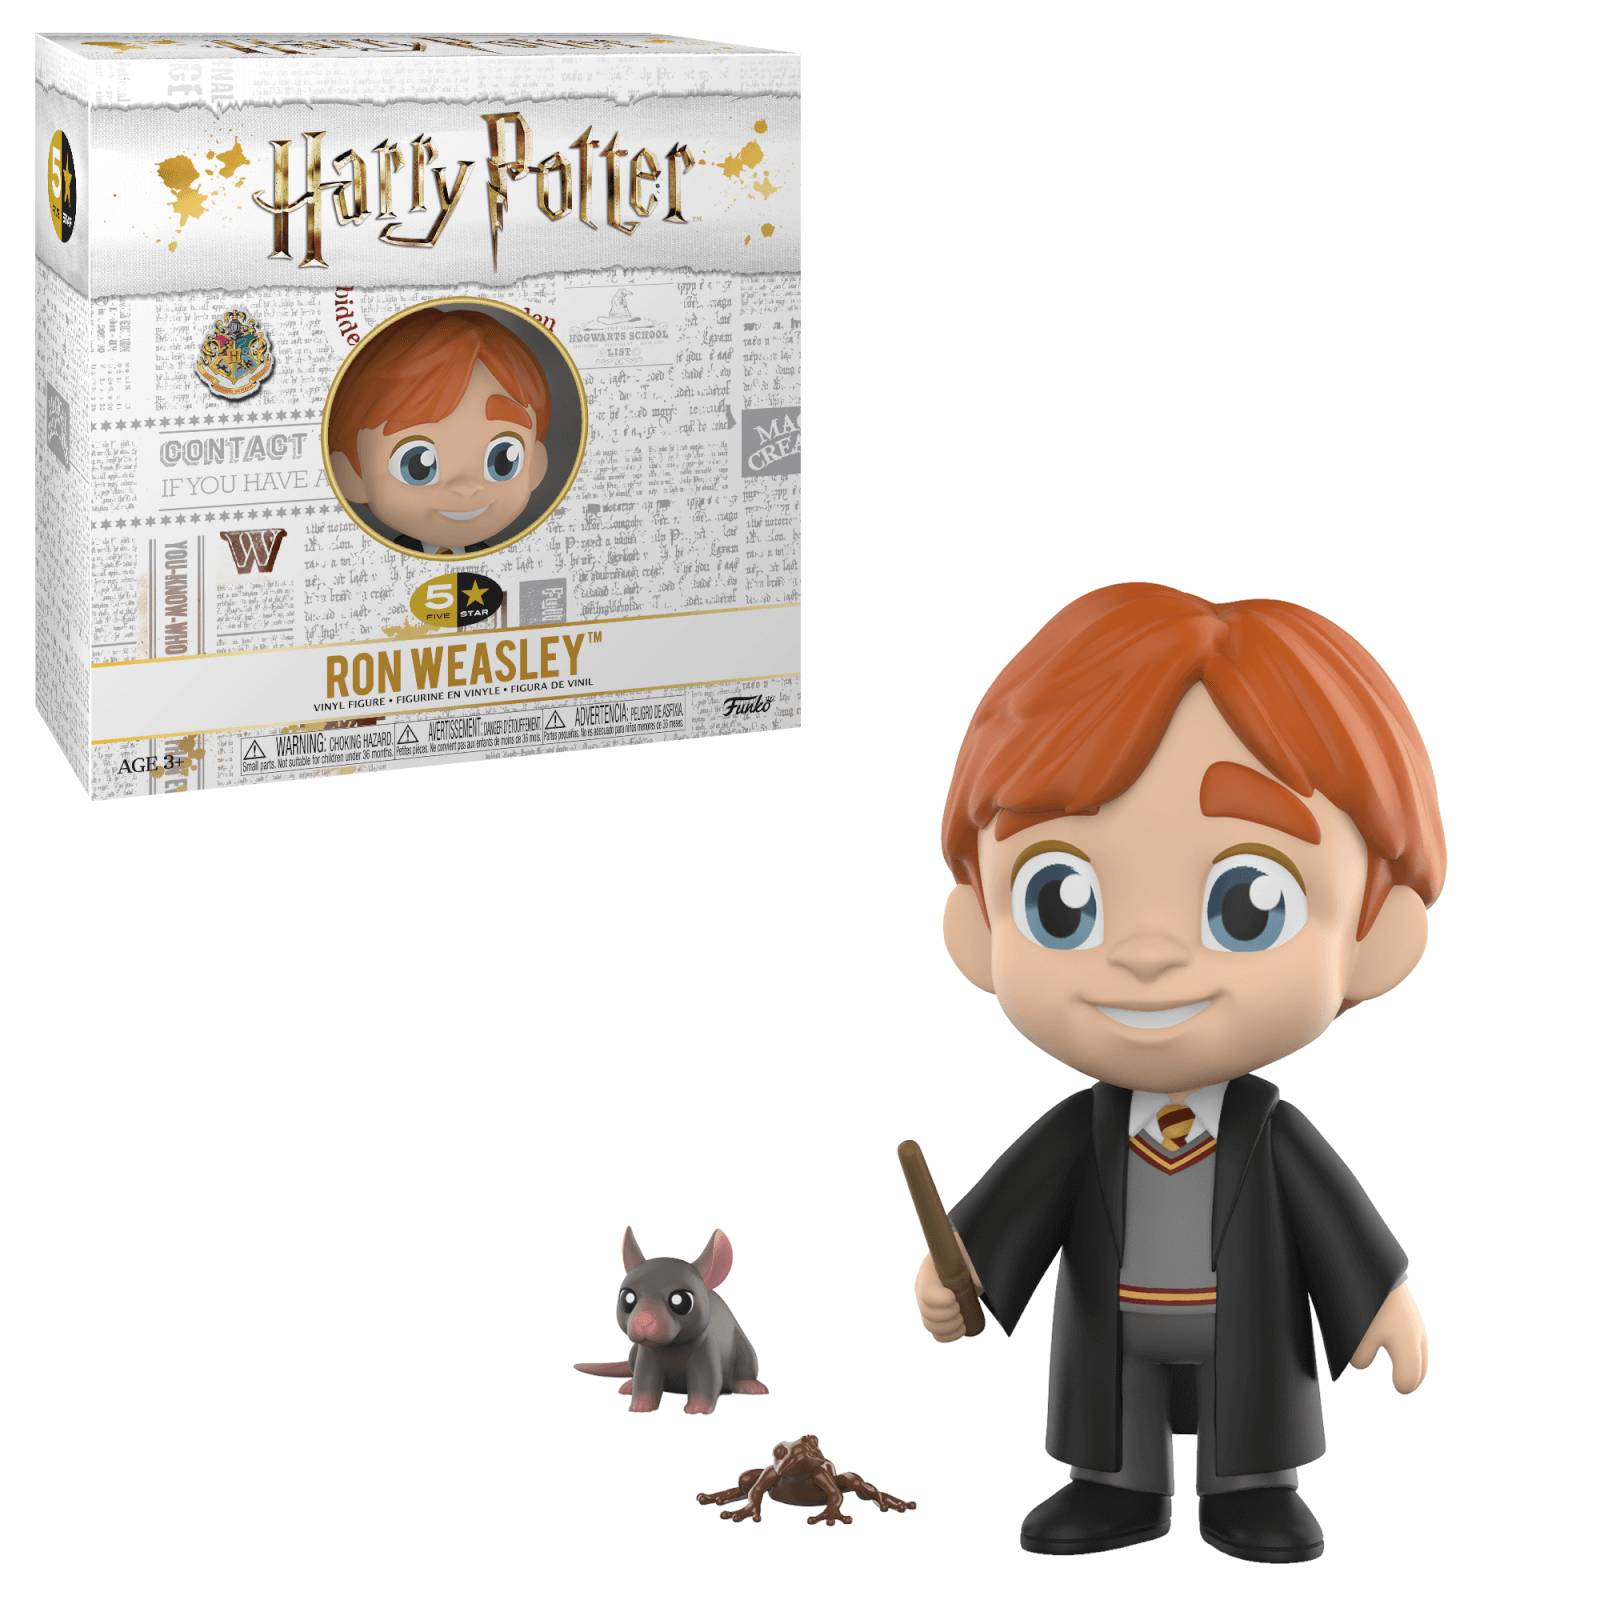 5 Star Figurine Harry Potter Funko 5 Star - Ron Weasley